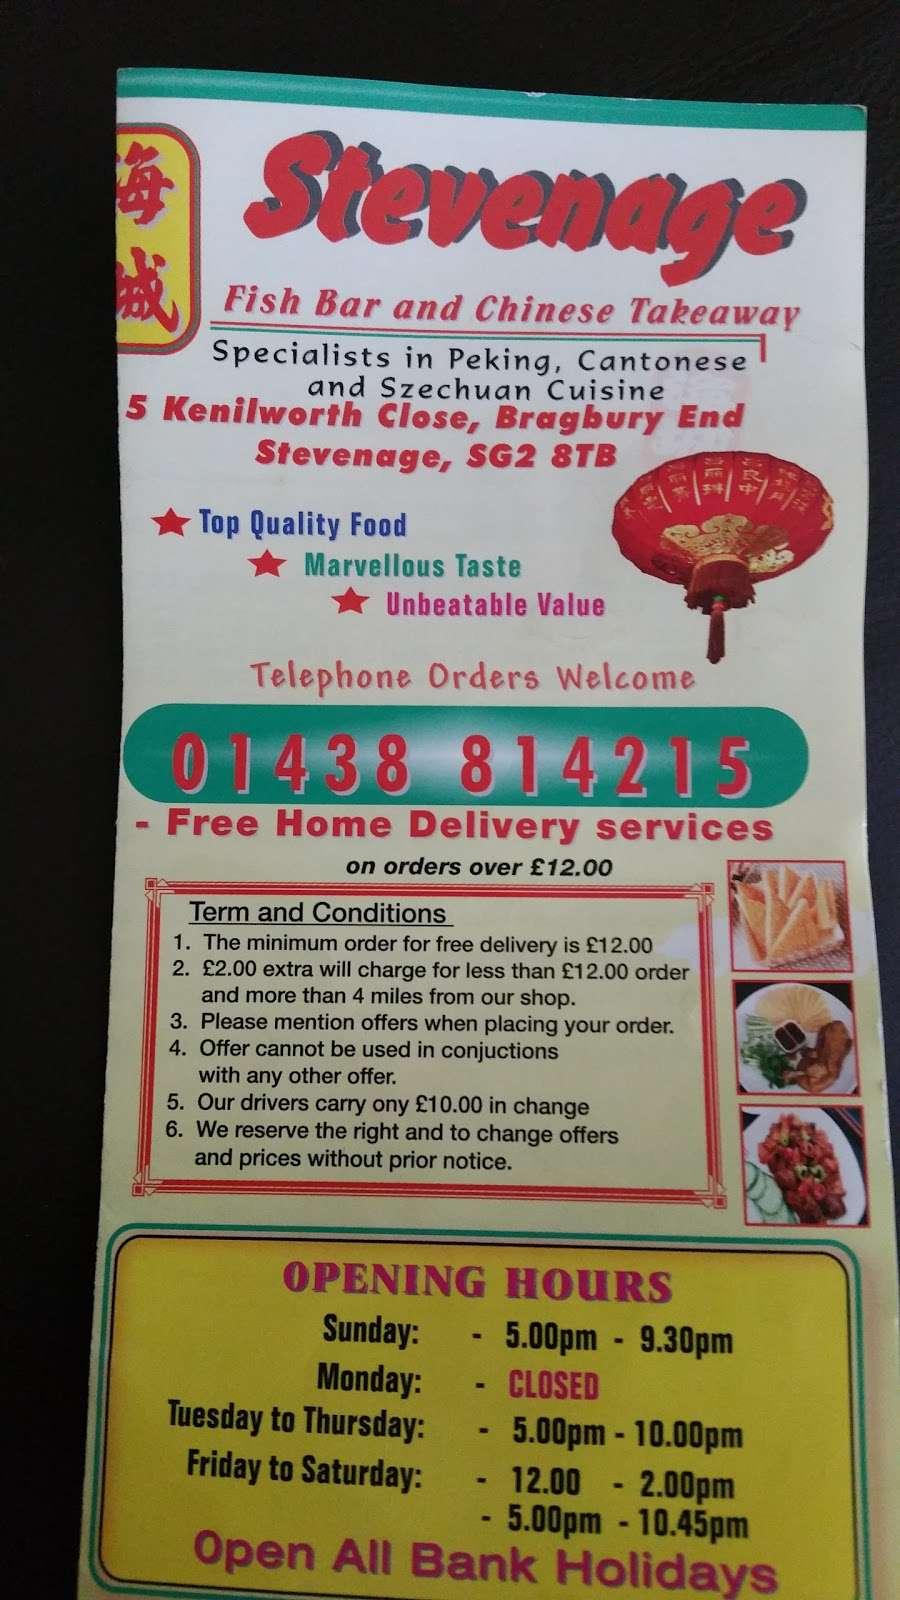 Stevenage Fish Bar - meal takeaway  | Photo 2 of 3 | Address: 5 Kenilworth Cl, Bragbury End, Stevenage SG2 8TB, UK | Phone: 01438 814215